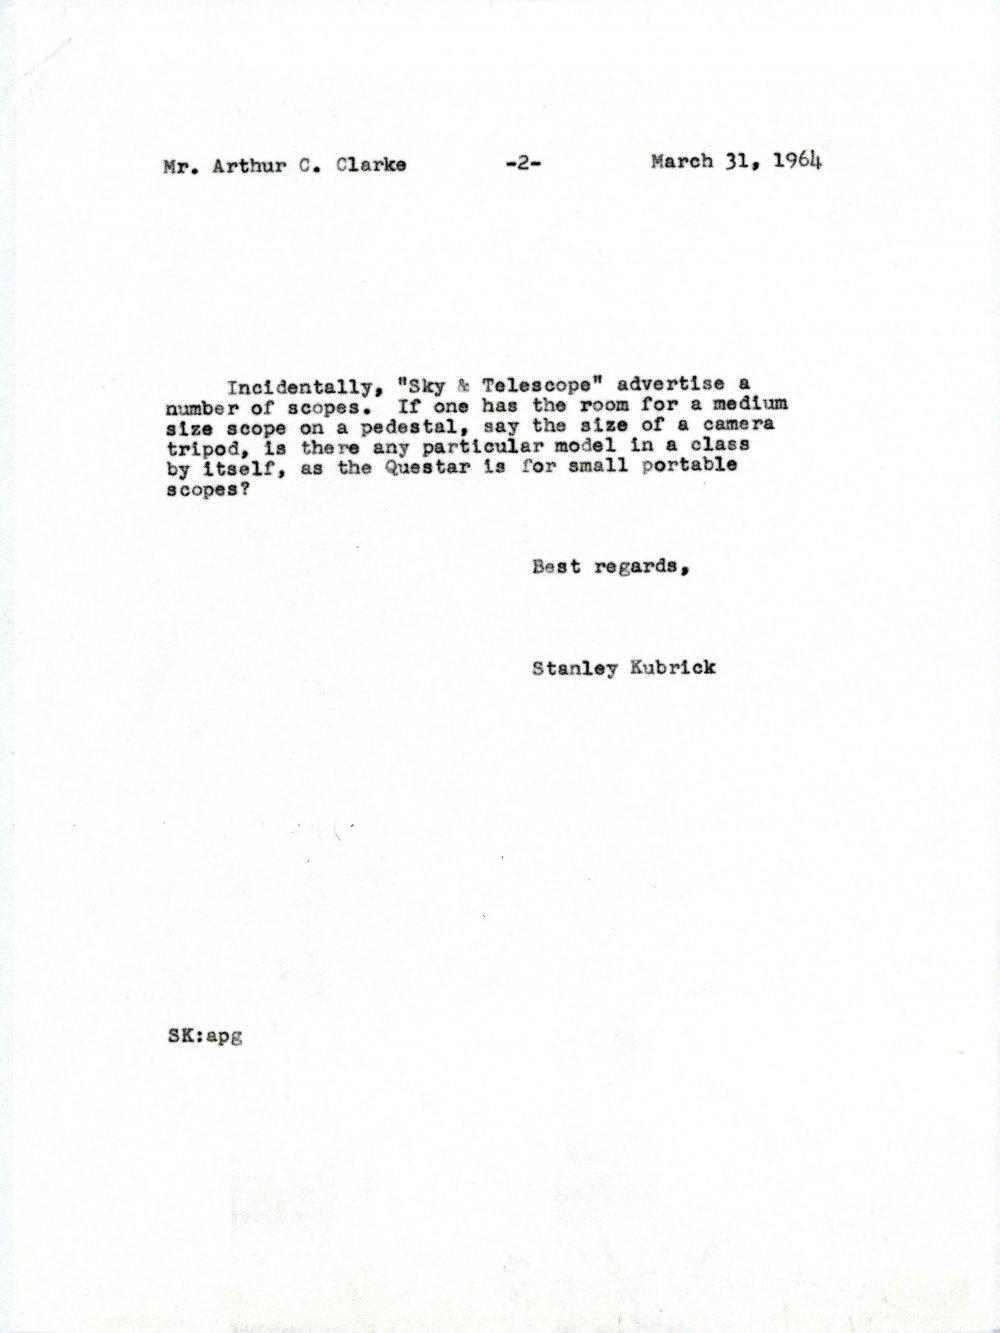 Letter from Stanley Kubrick to Arthur C. Clarke